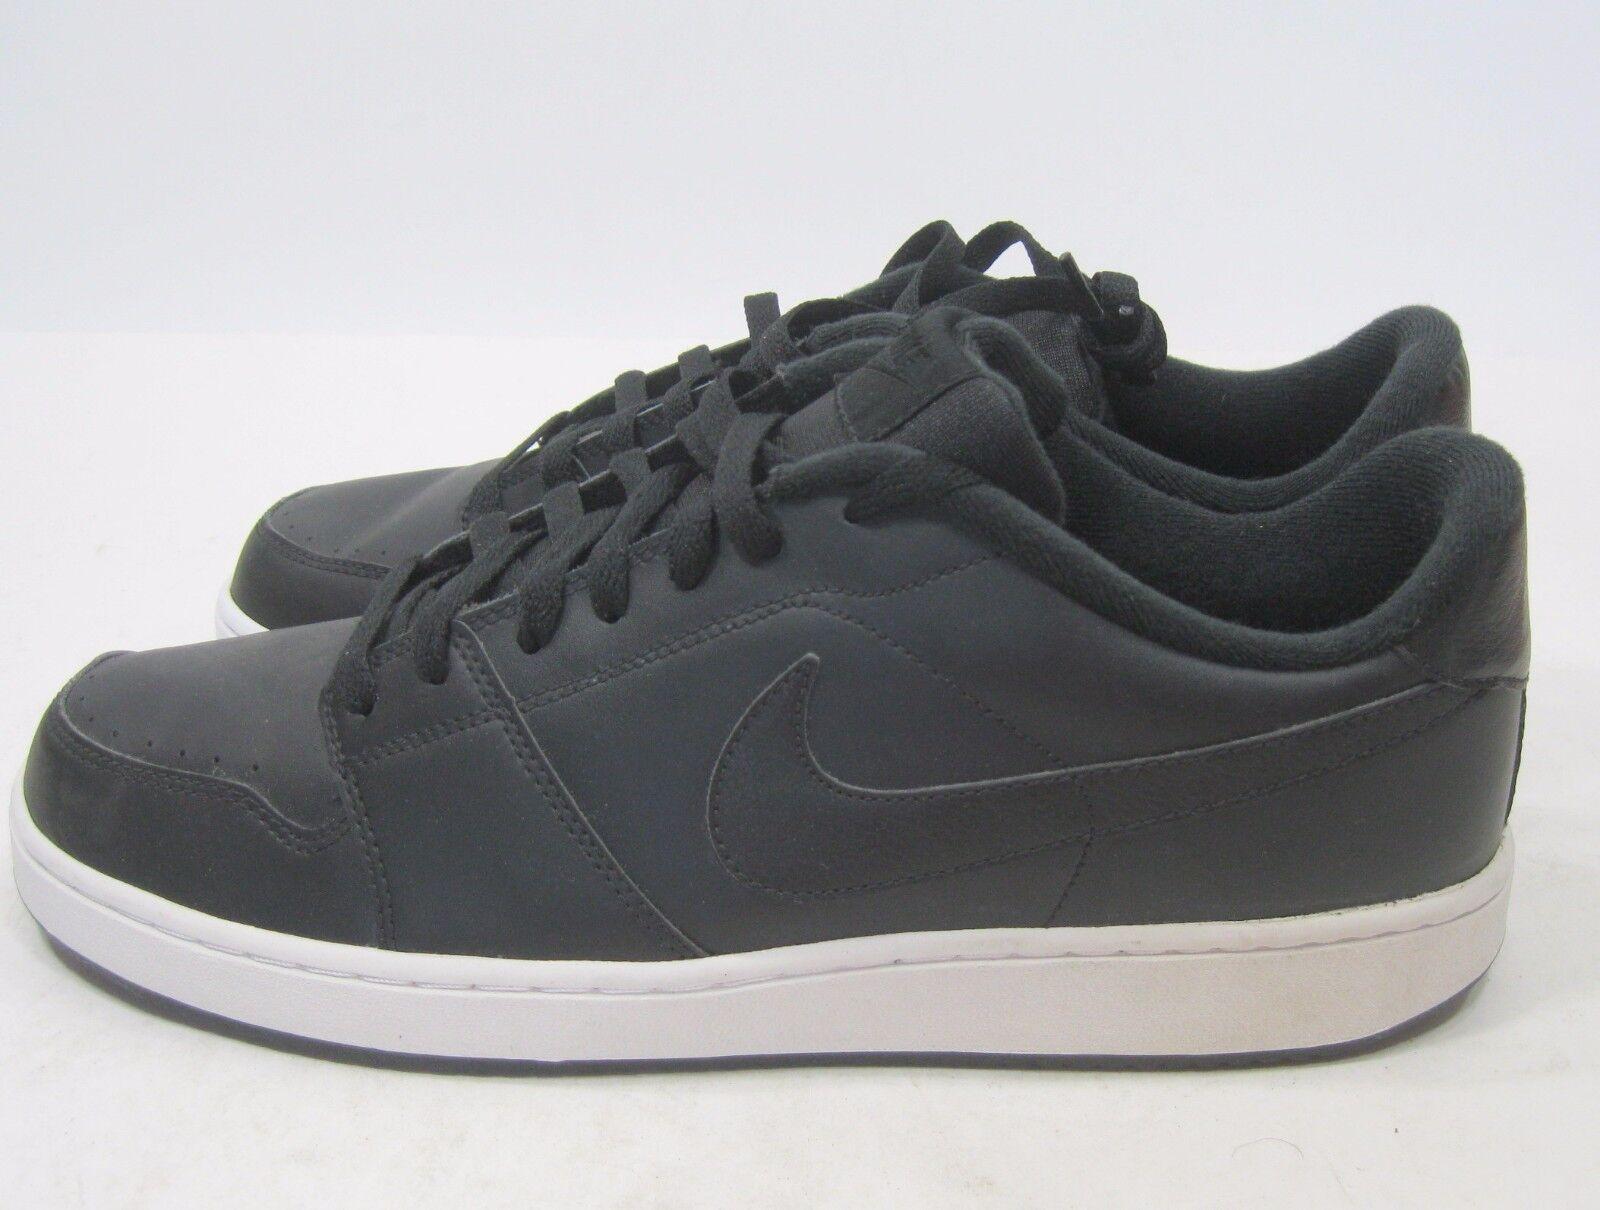 New Nike Backboard Mens Athletic Sneakers Black 378336-005 378336-005 378336-005 Size 12.5 266063